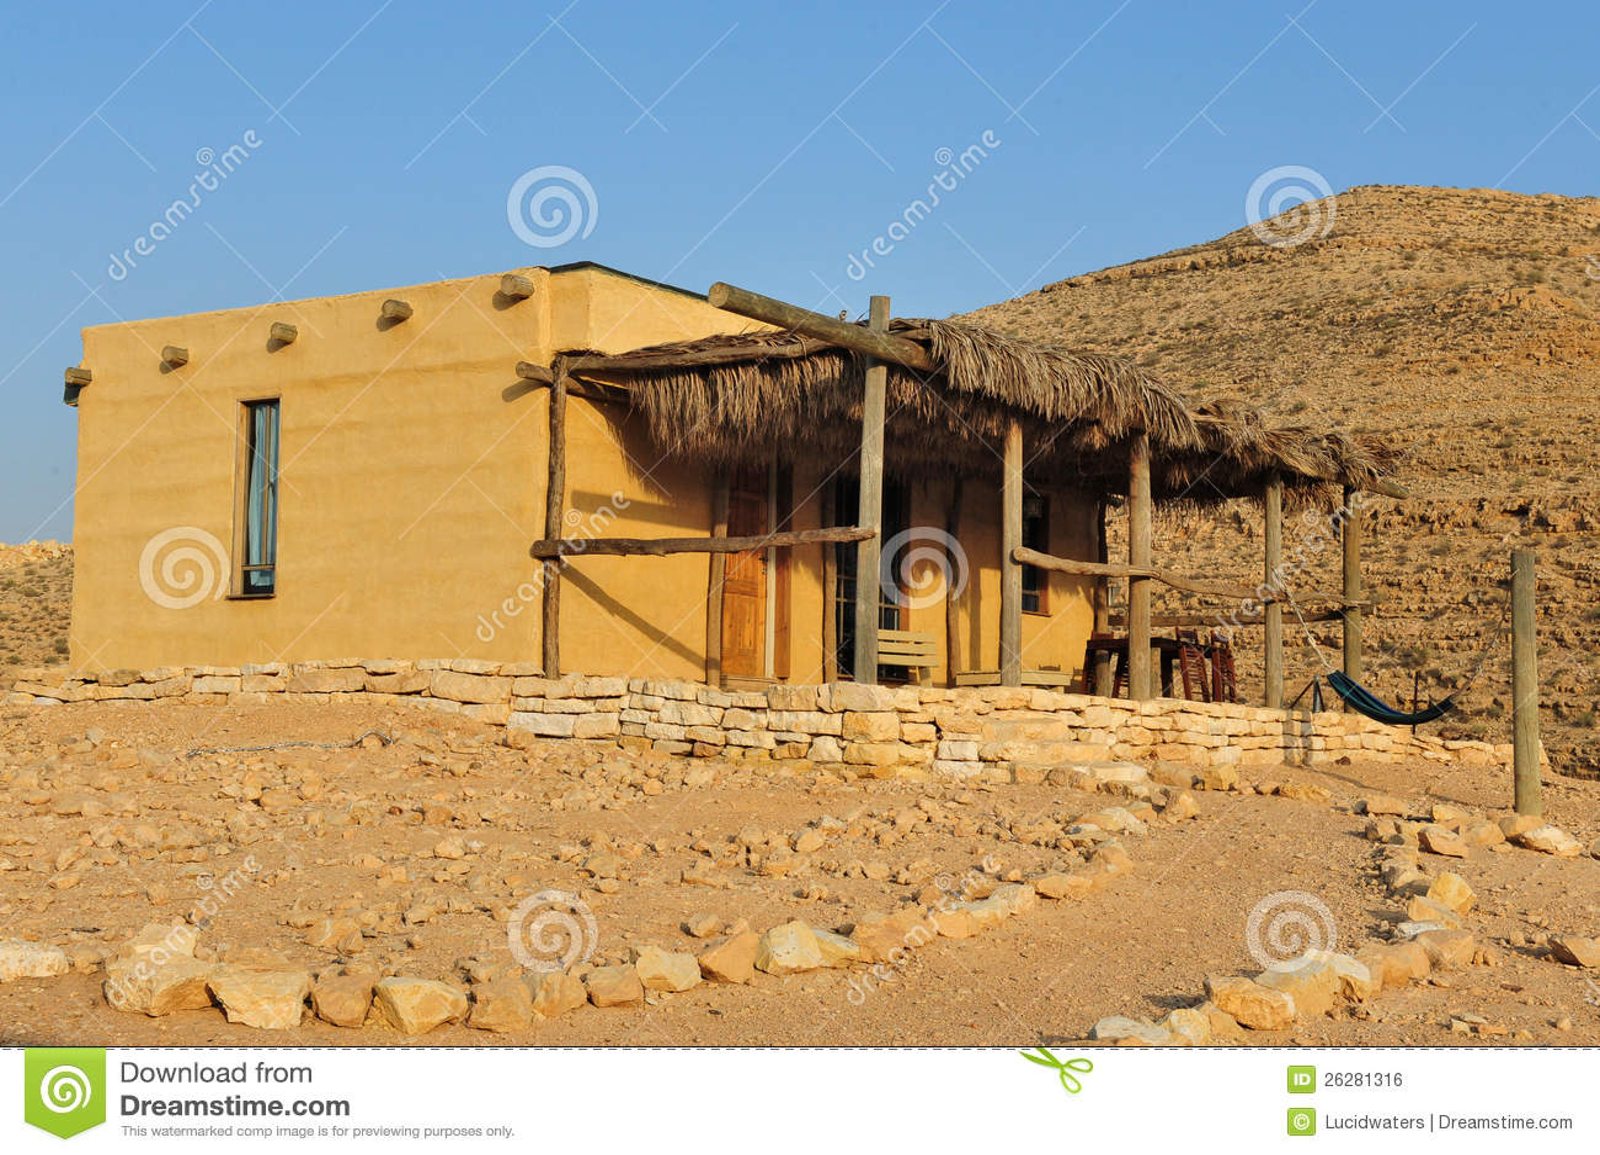 Desert lodge in israel royalty free stock image image - Casas del desierto ...